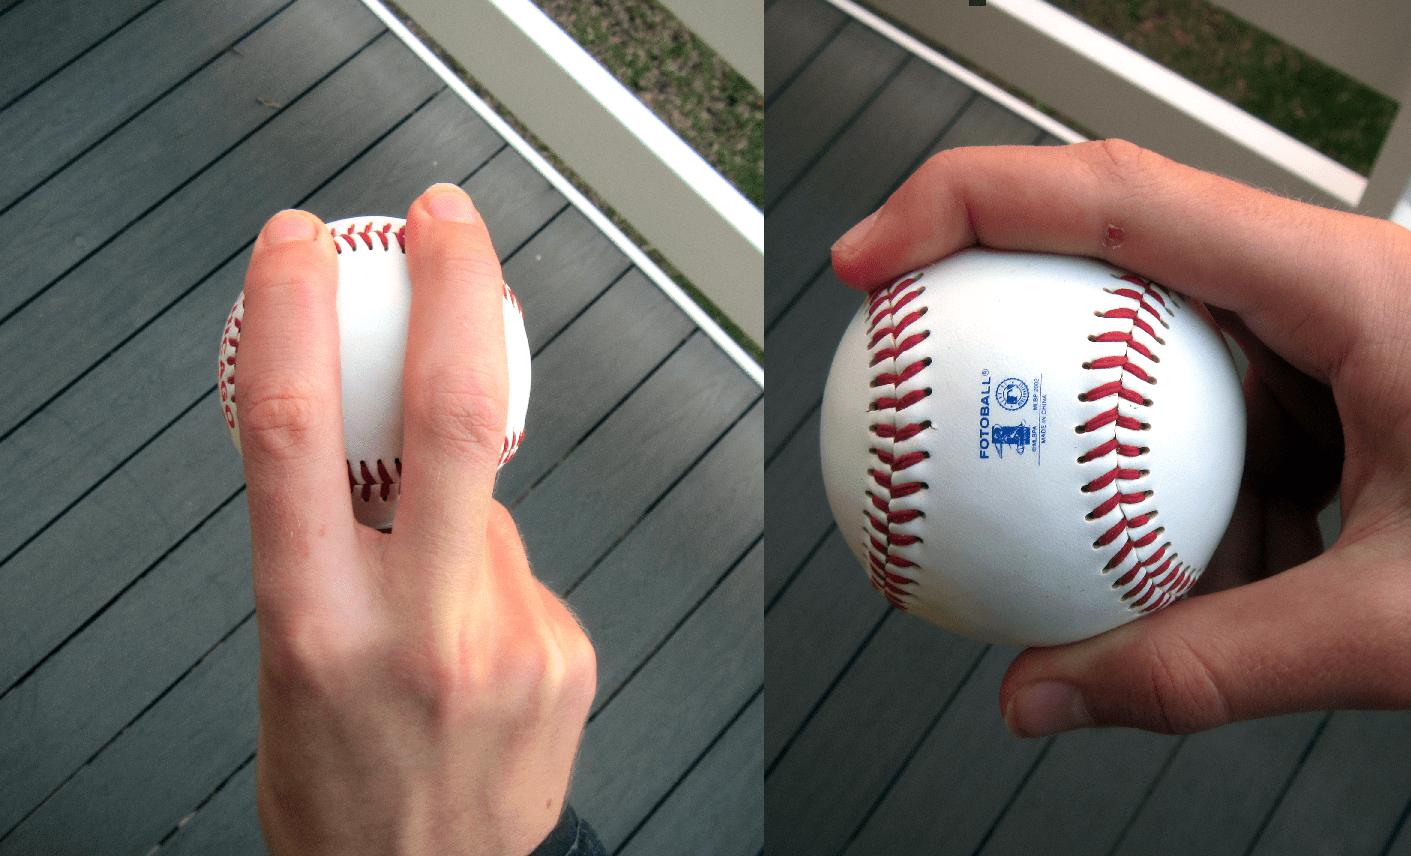 Four-seam fastball grip.